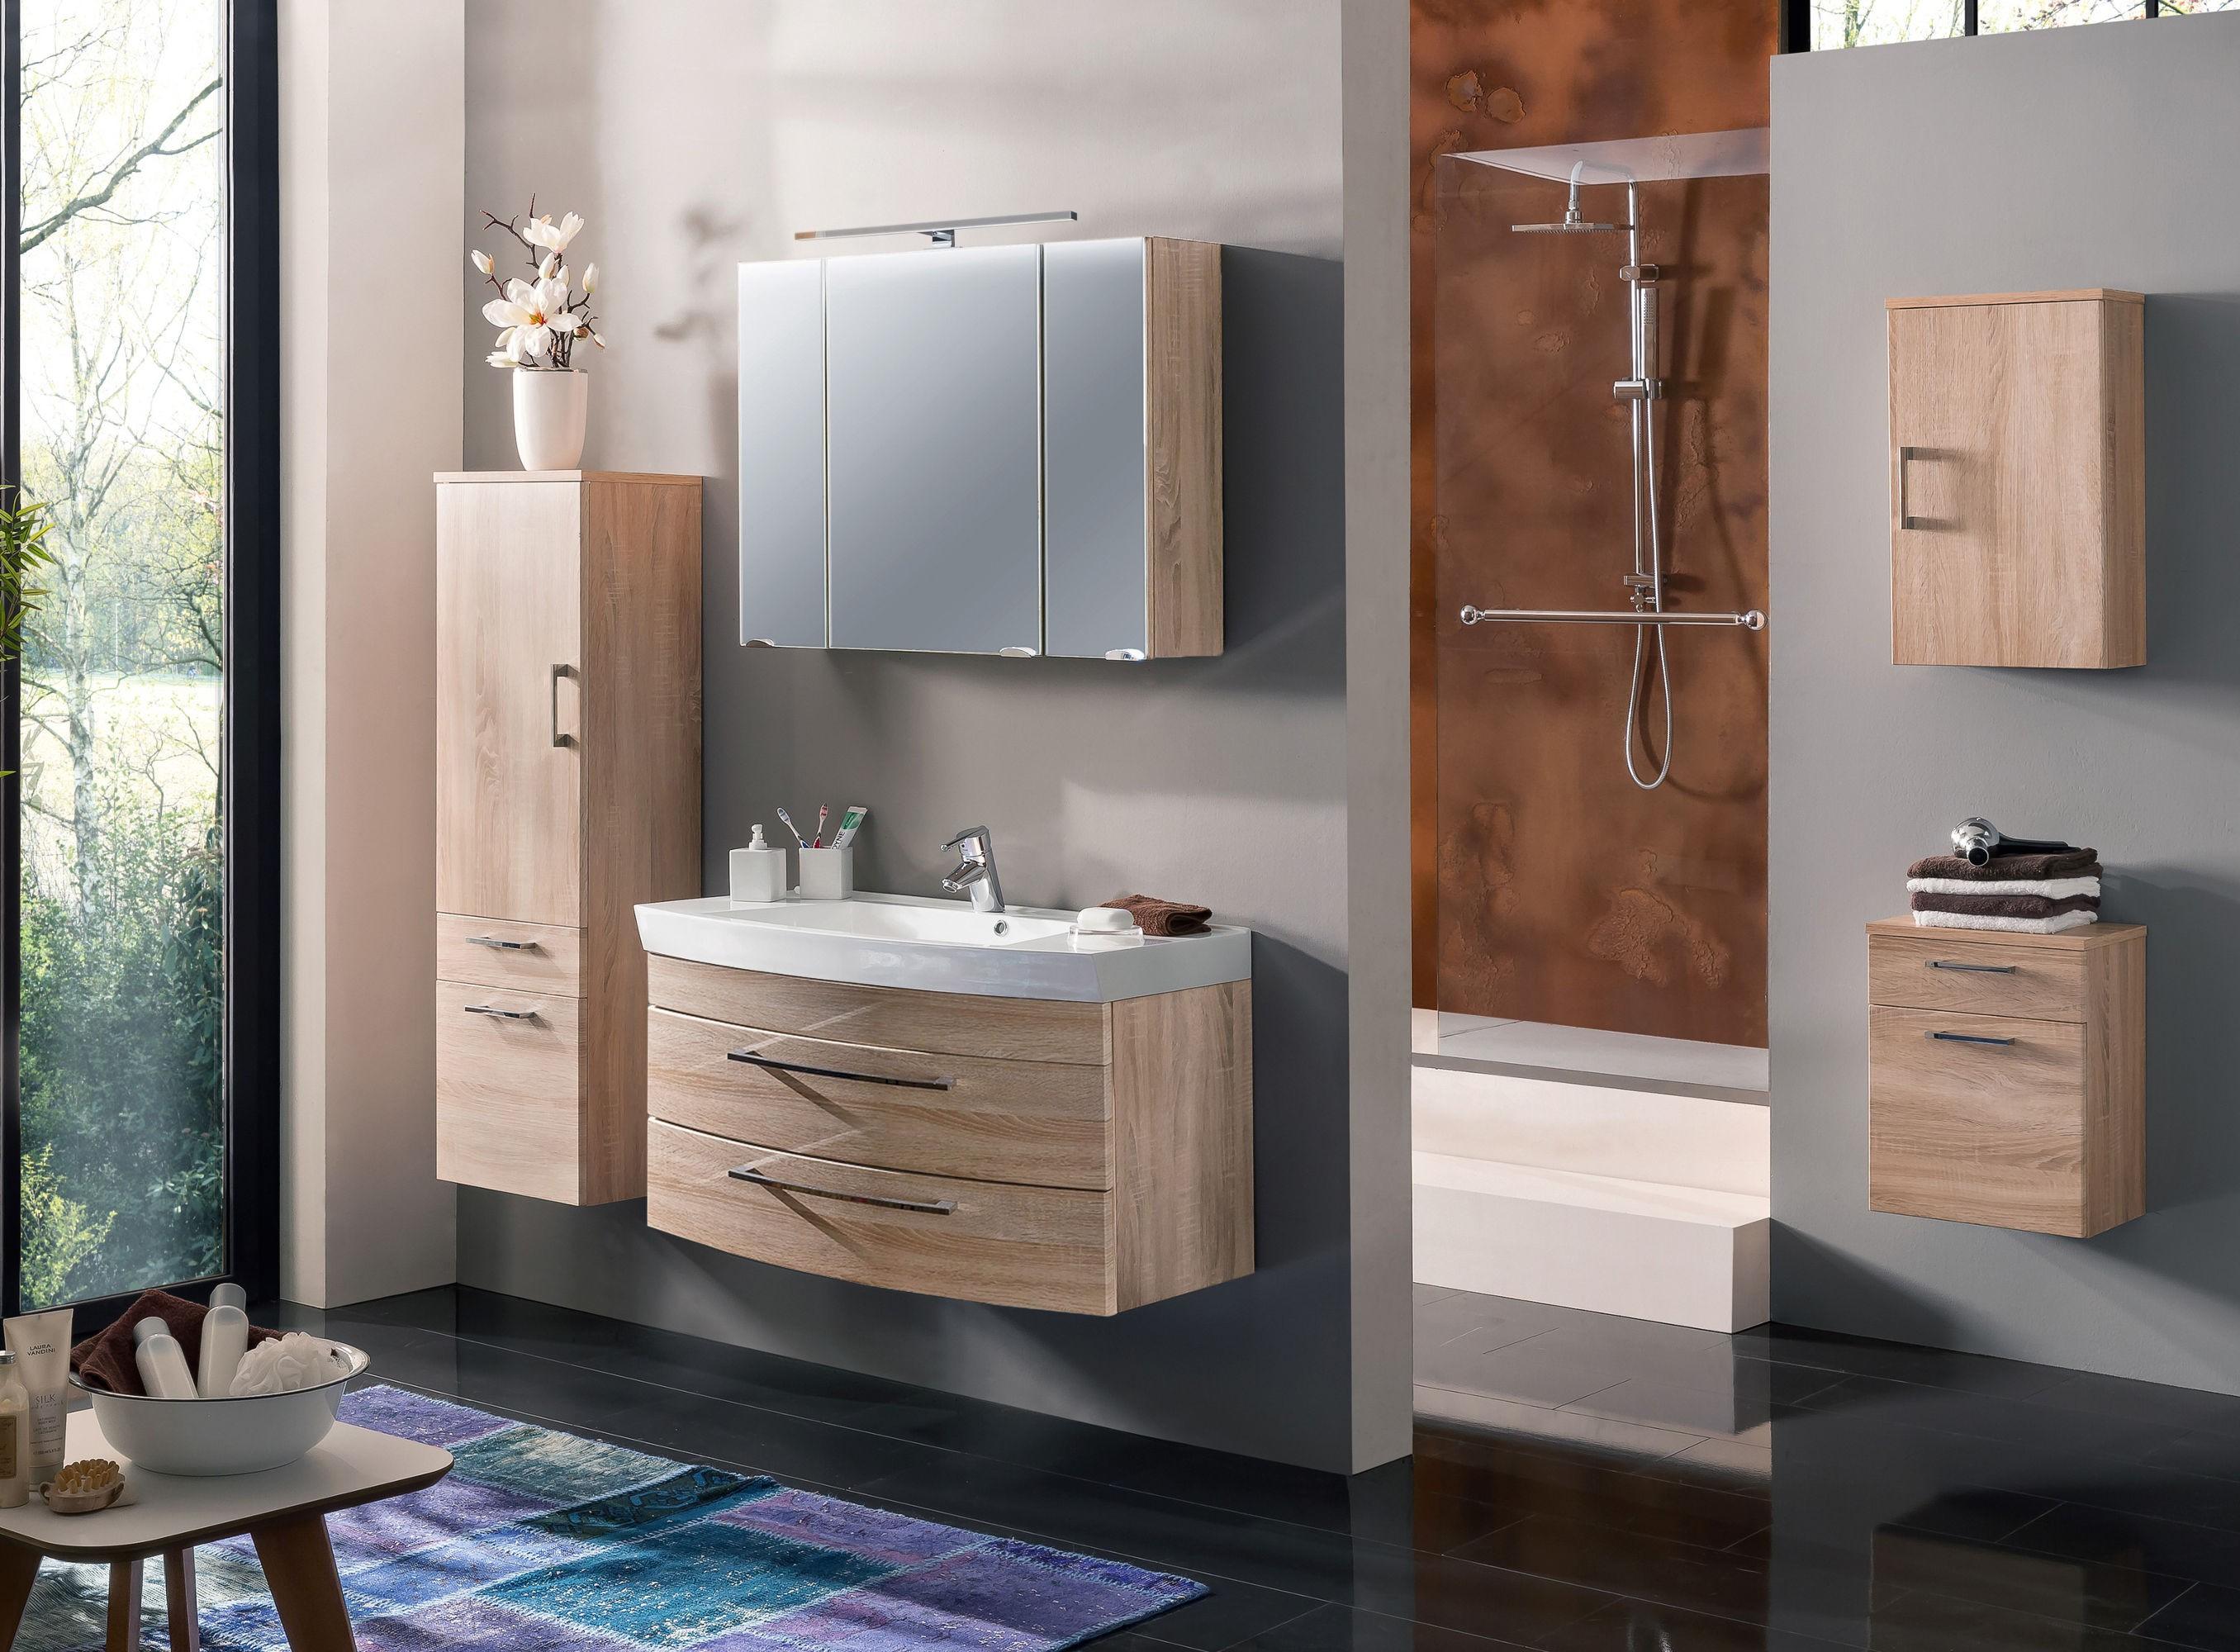 bad h ngeschrank rima 1 t rig 40 cm breit eiche sonoma bad rima. Black Bedroom Furniture Sets. Home Design Ideas